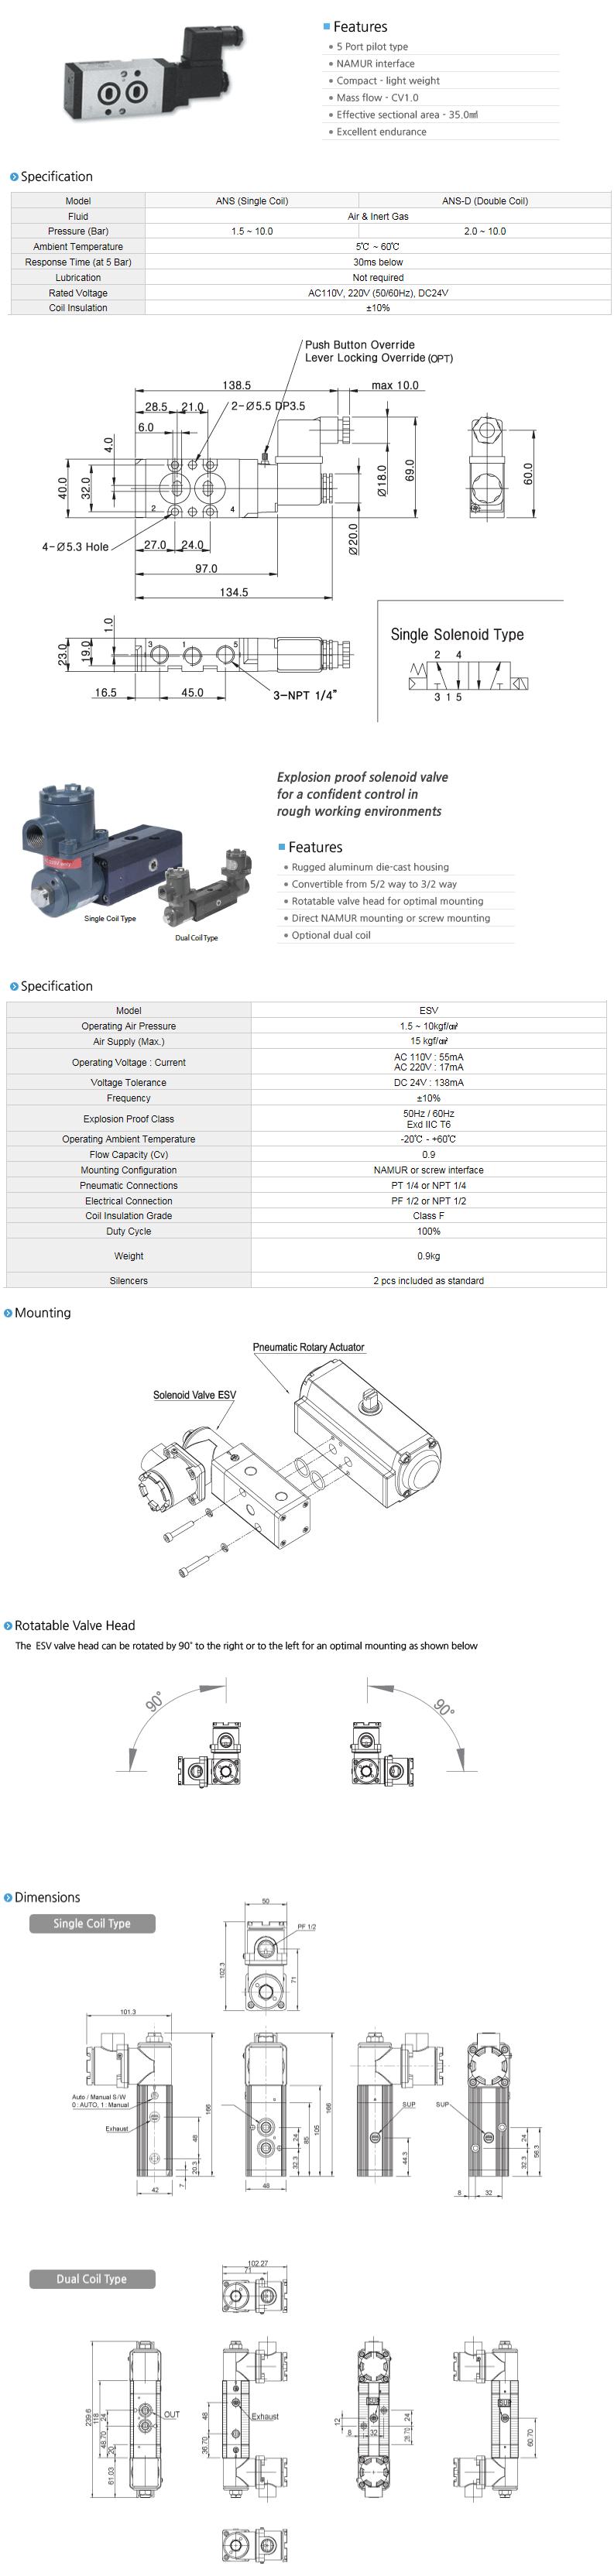 AUTOMA Solenoid Valve ANS Series